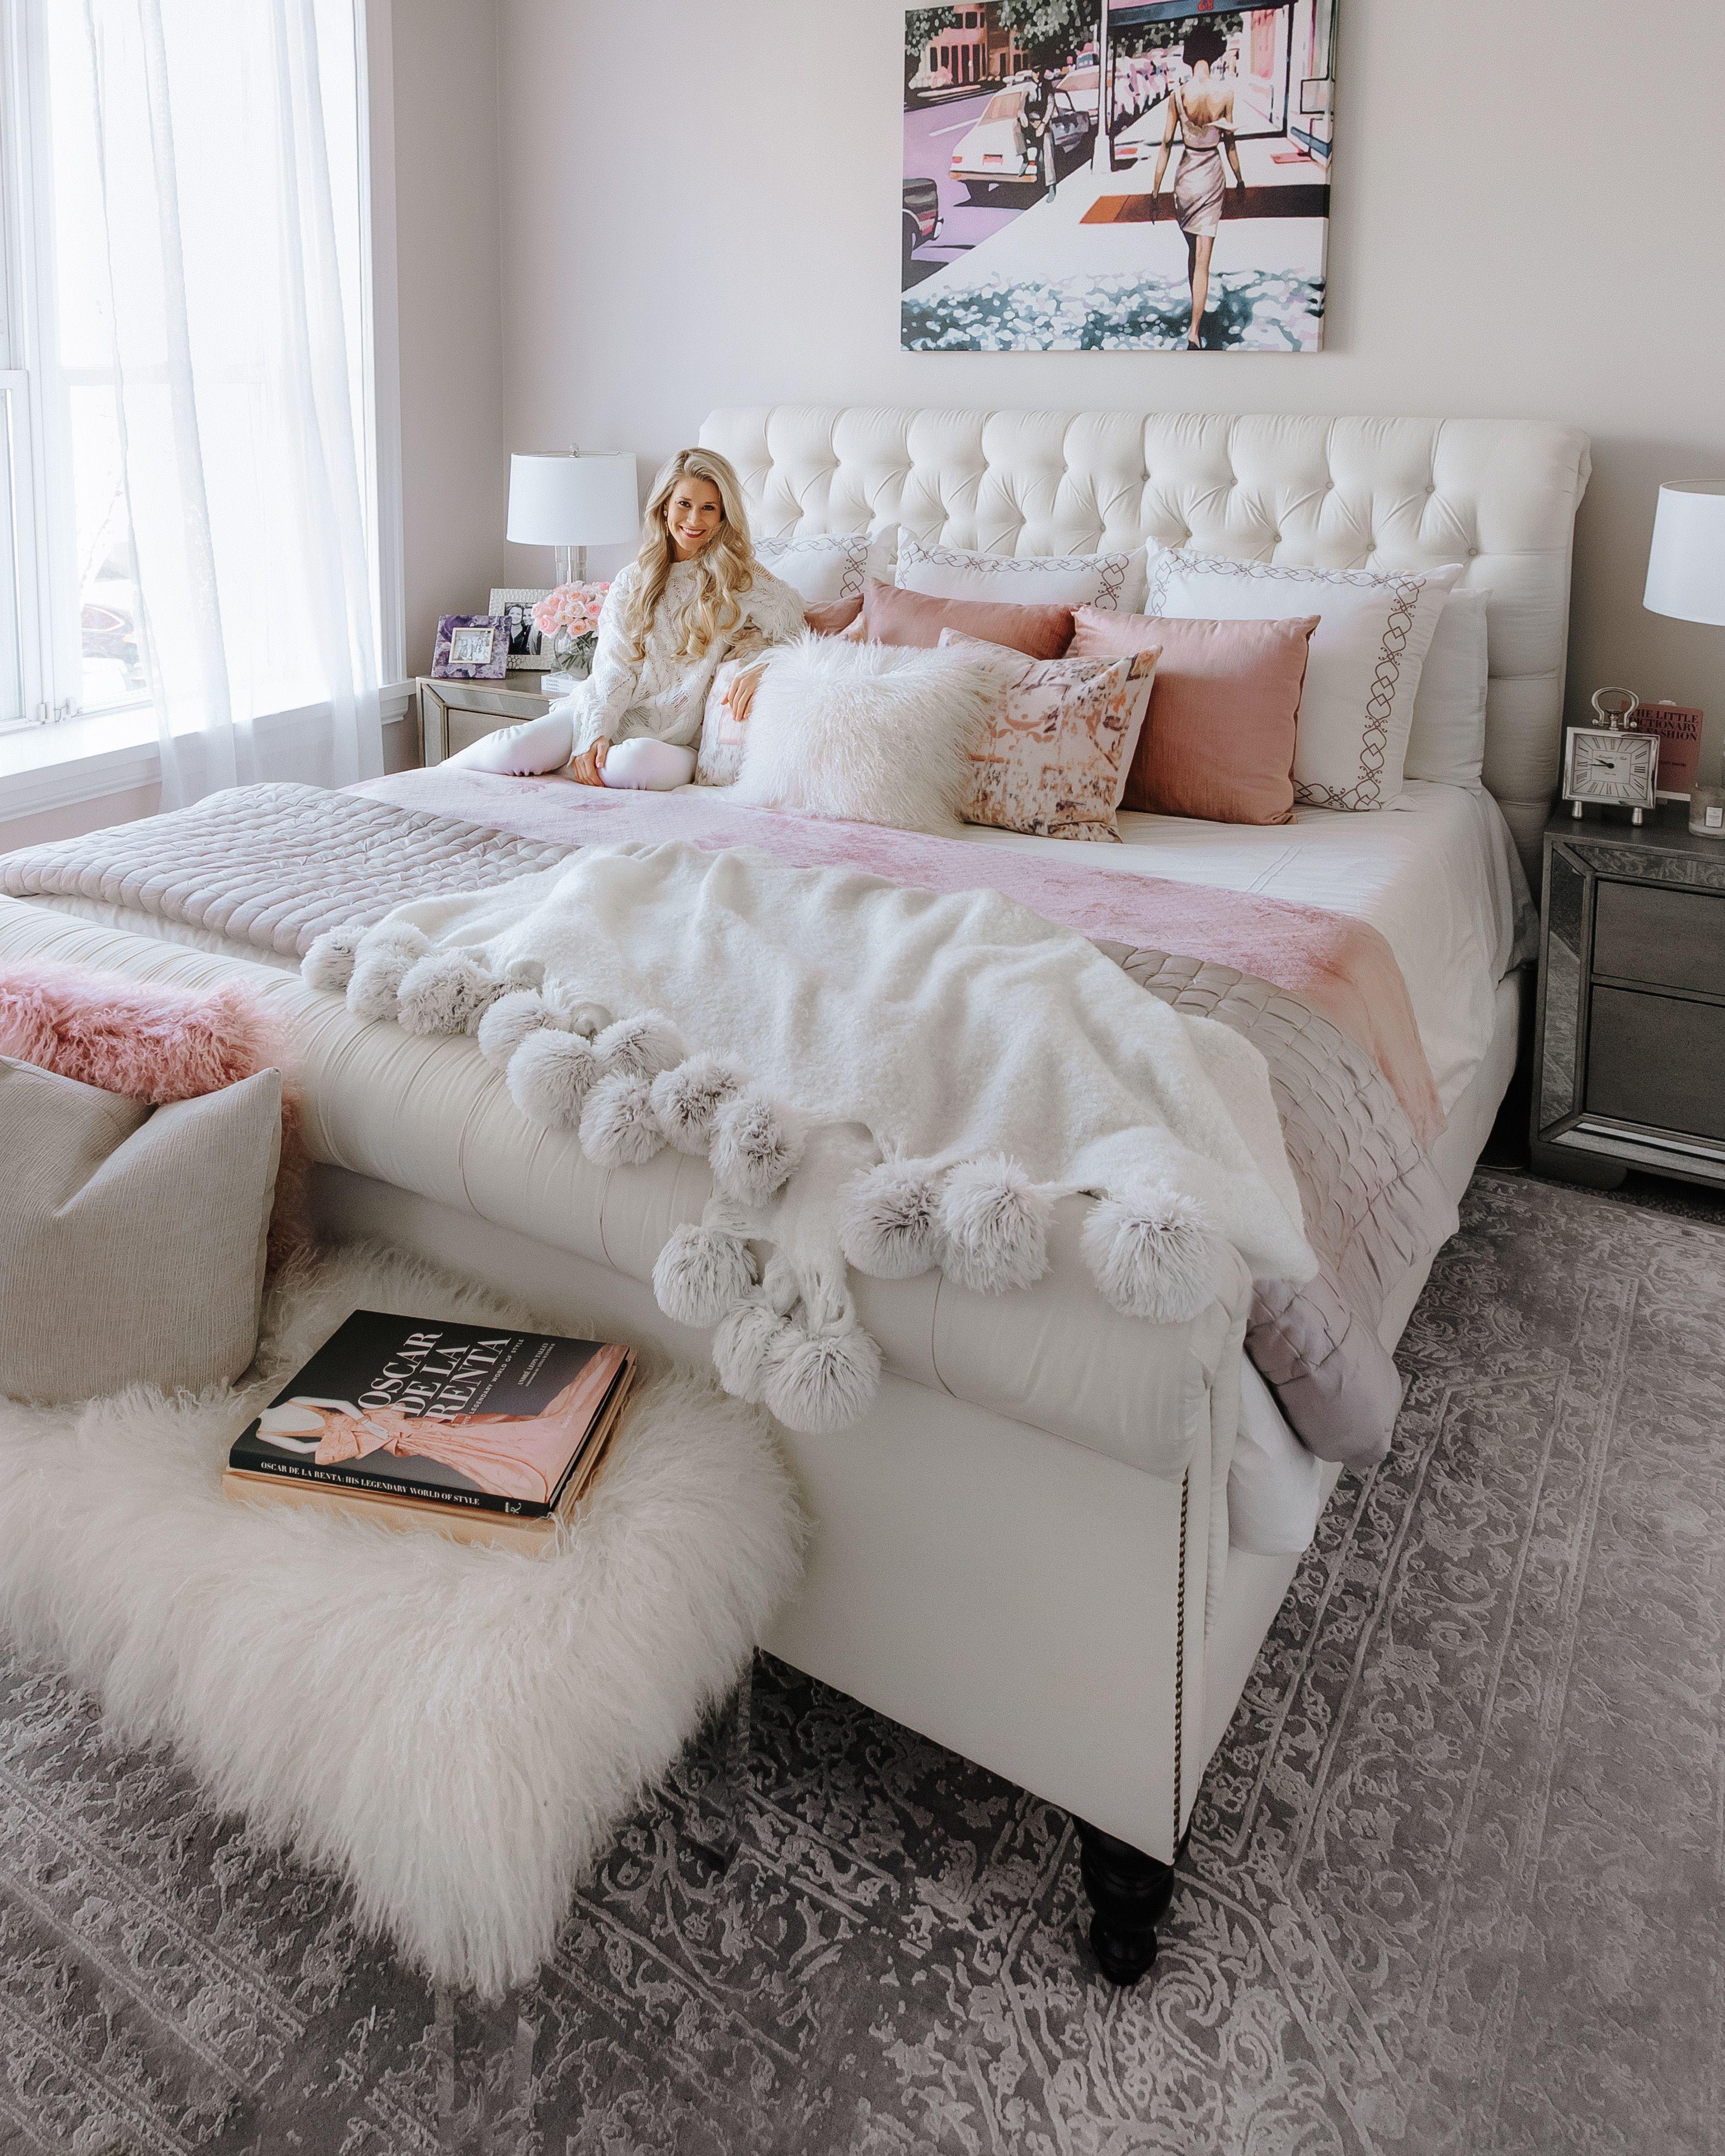 My home tour feminine bedroomroom decor also best room images in bedroom ideas rh pinterest